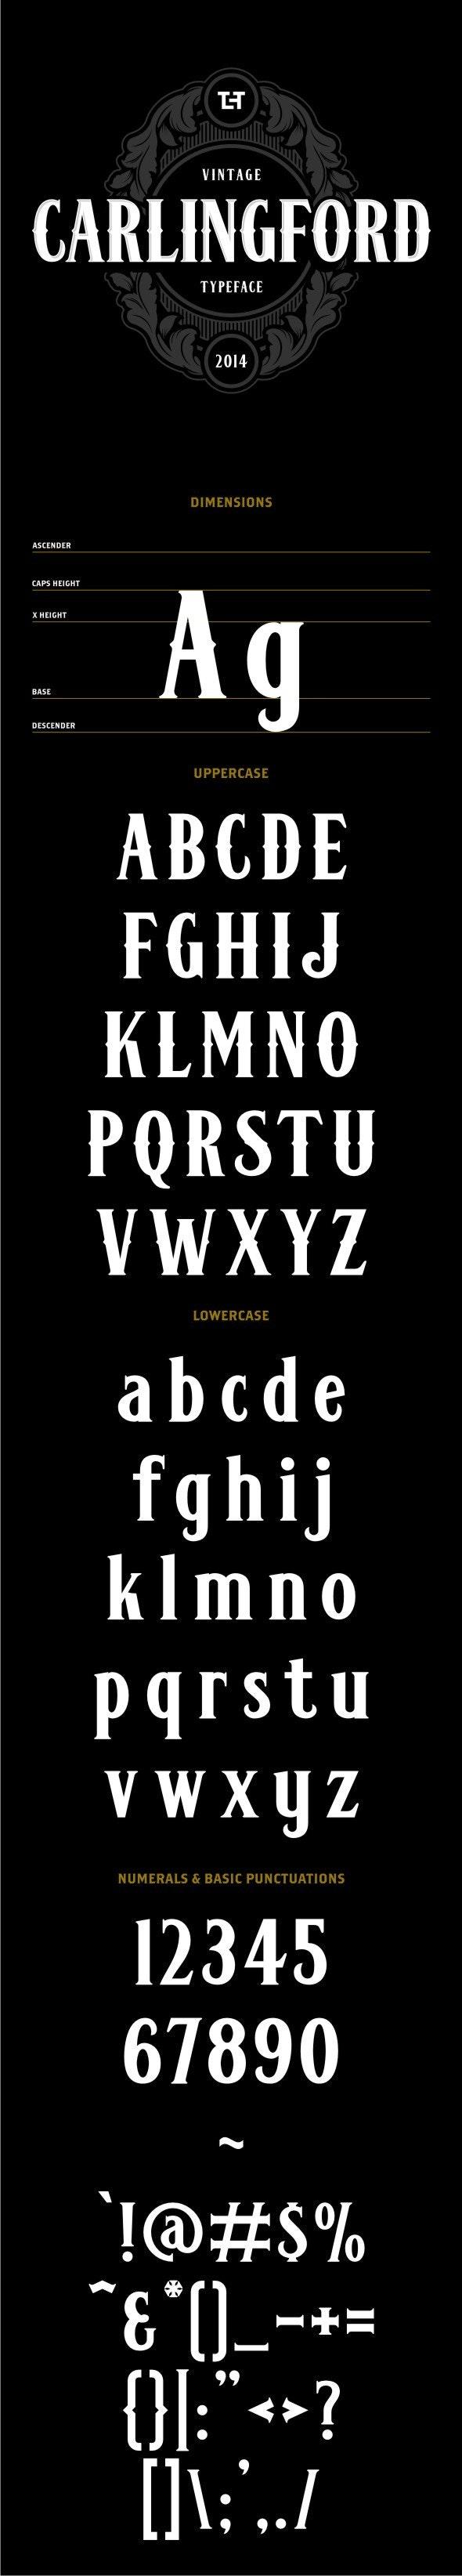 Carlingford Typeface - Gothic Decorative